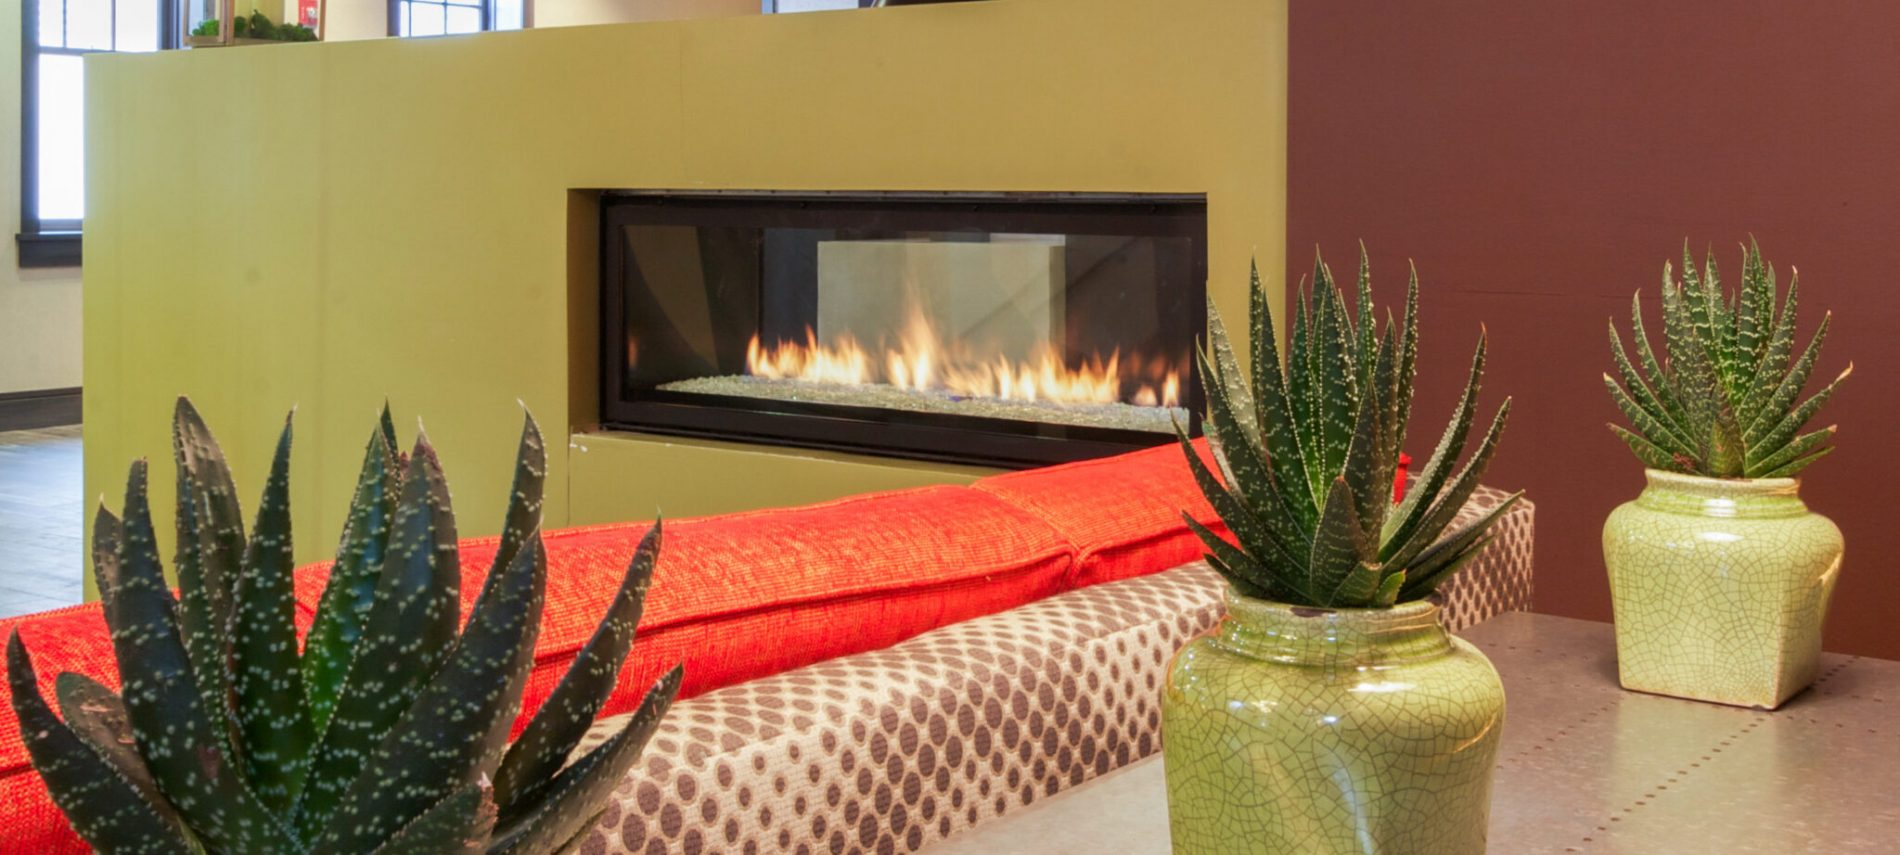 fireplace plants contemporary decor hotel lobby